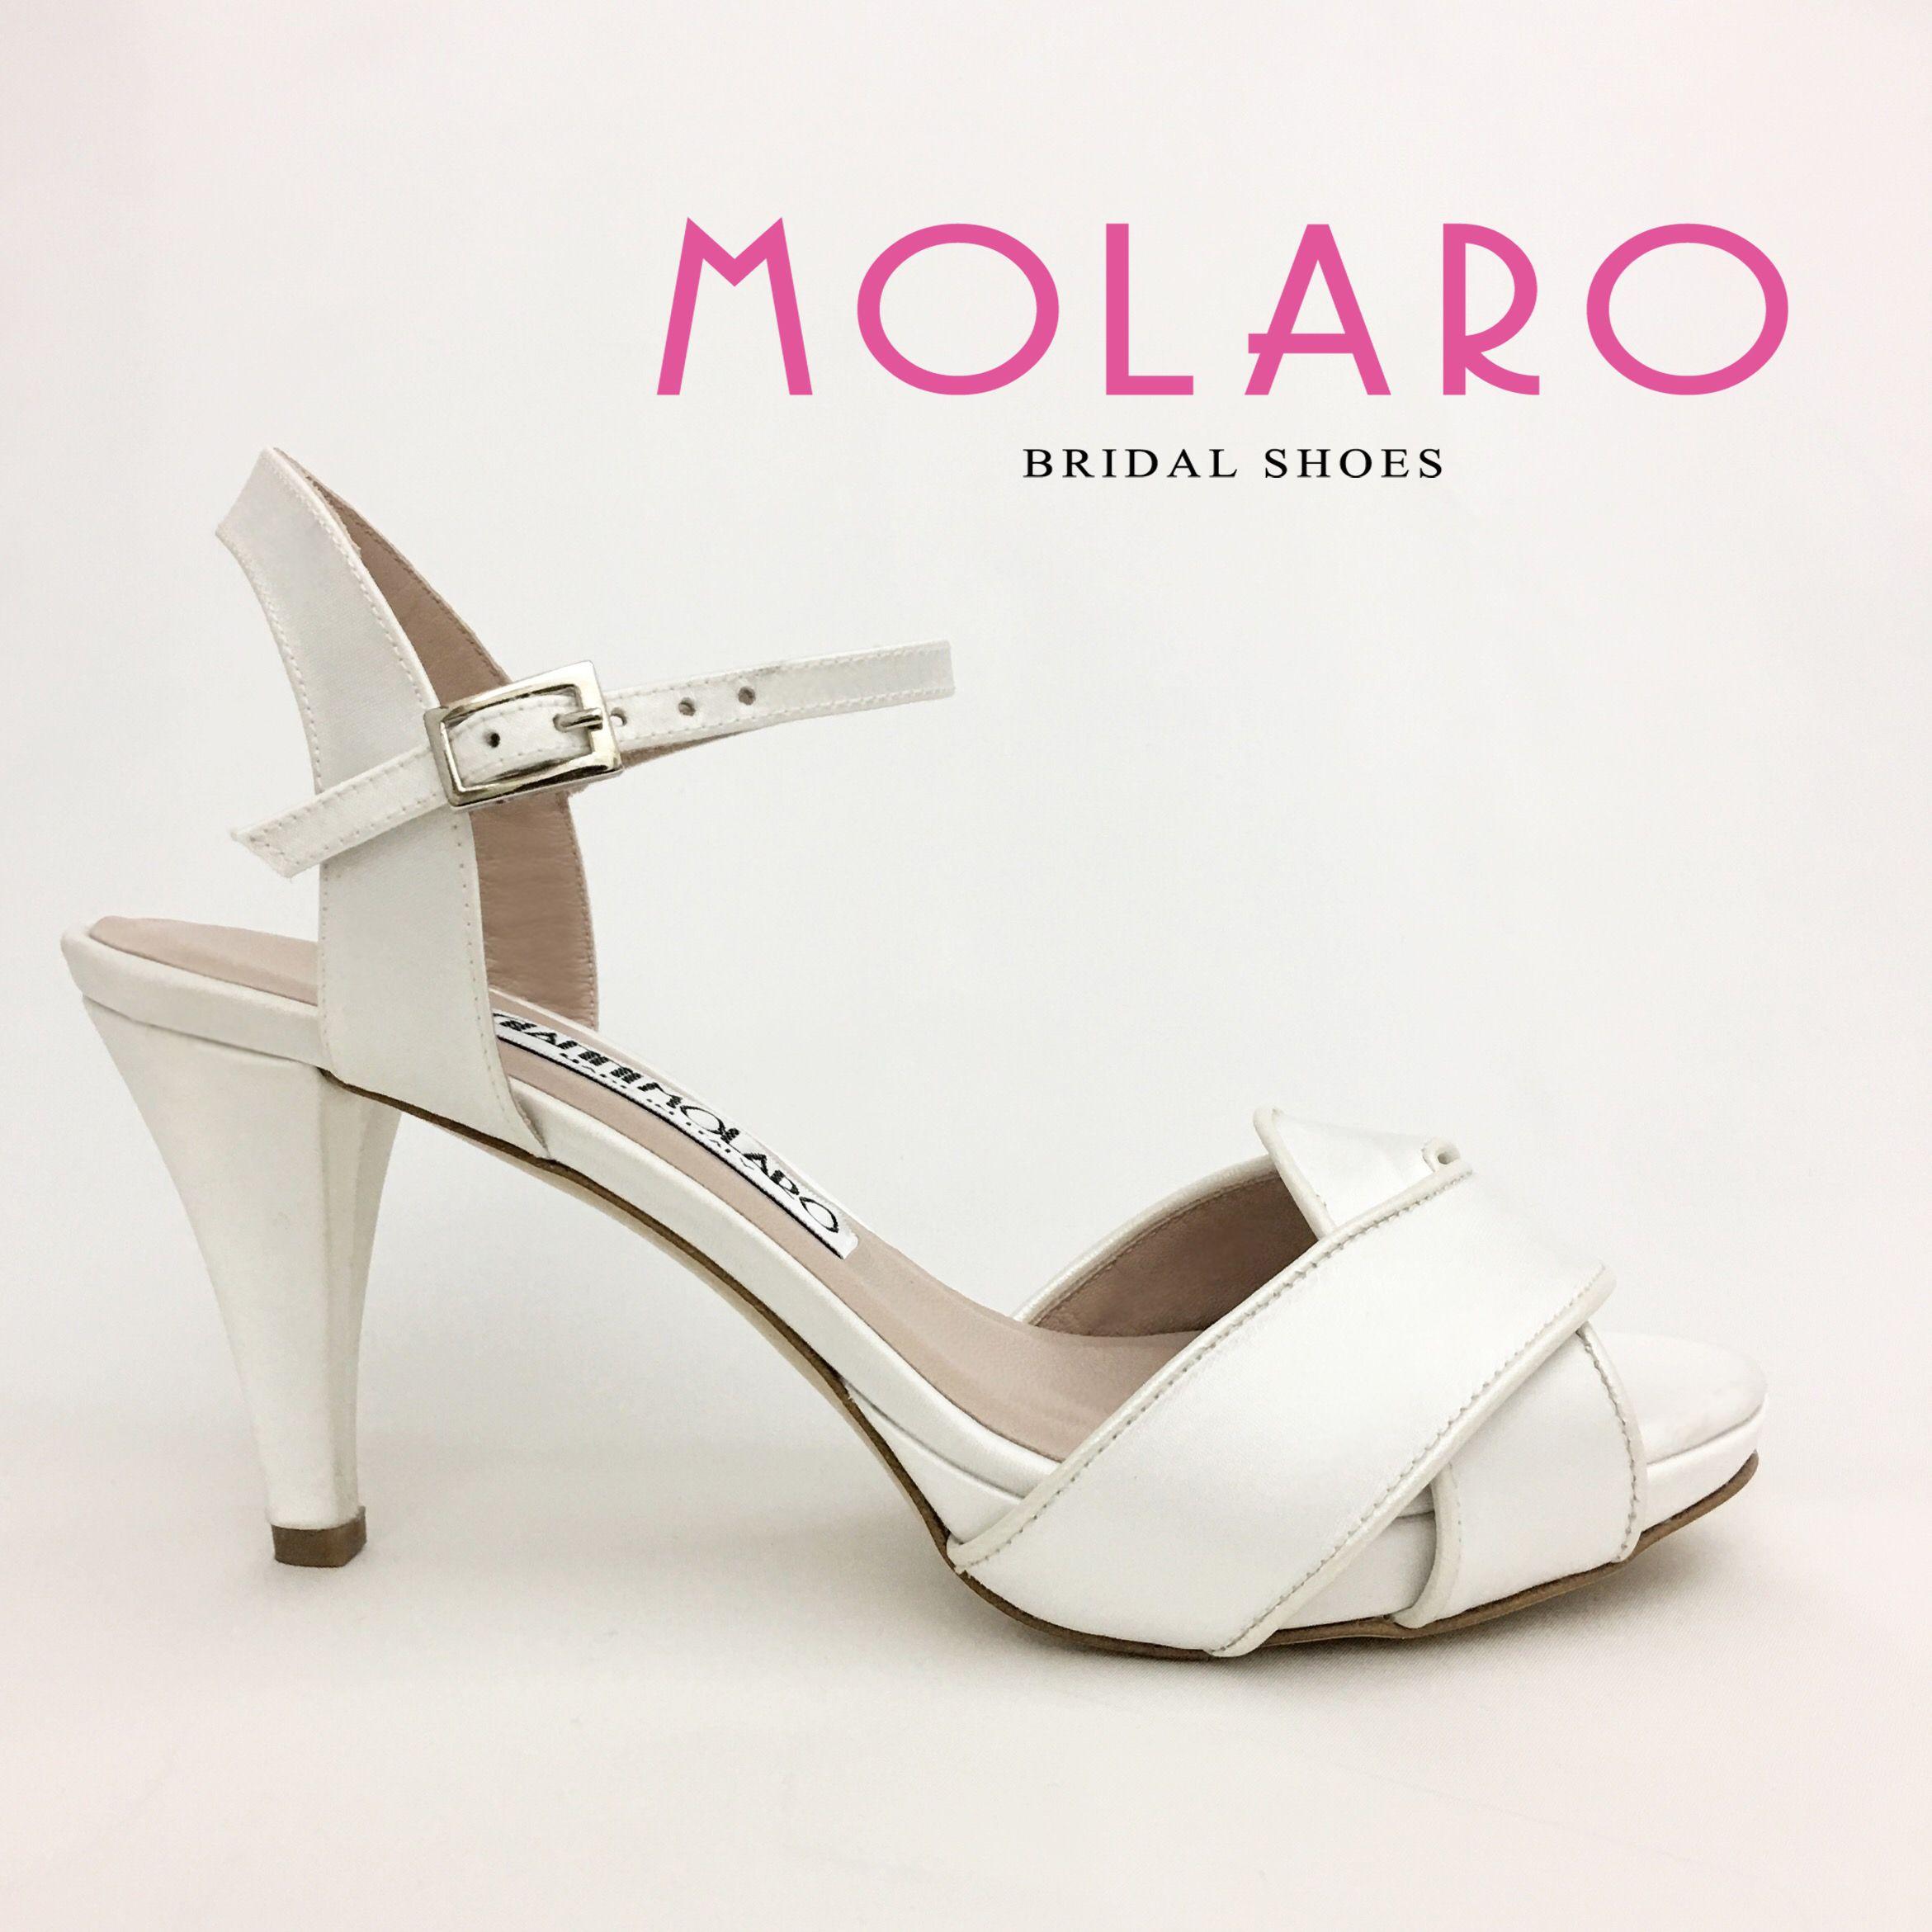 Scarpe Da Sposa Bianco Seta.Gianni Molaro Bridal Shoes Sandalo In Raso Bianco Seta Art